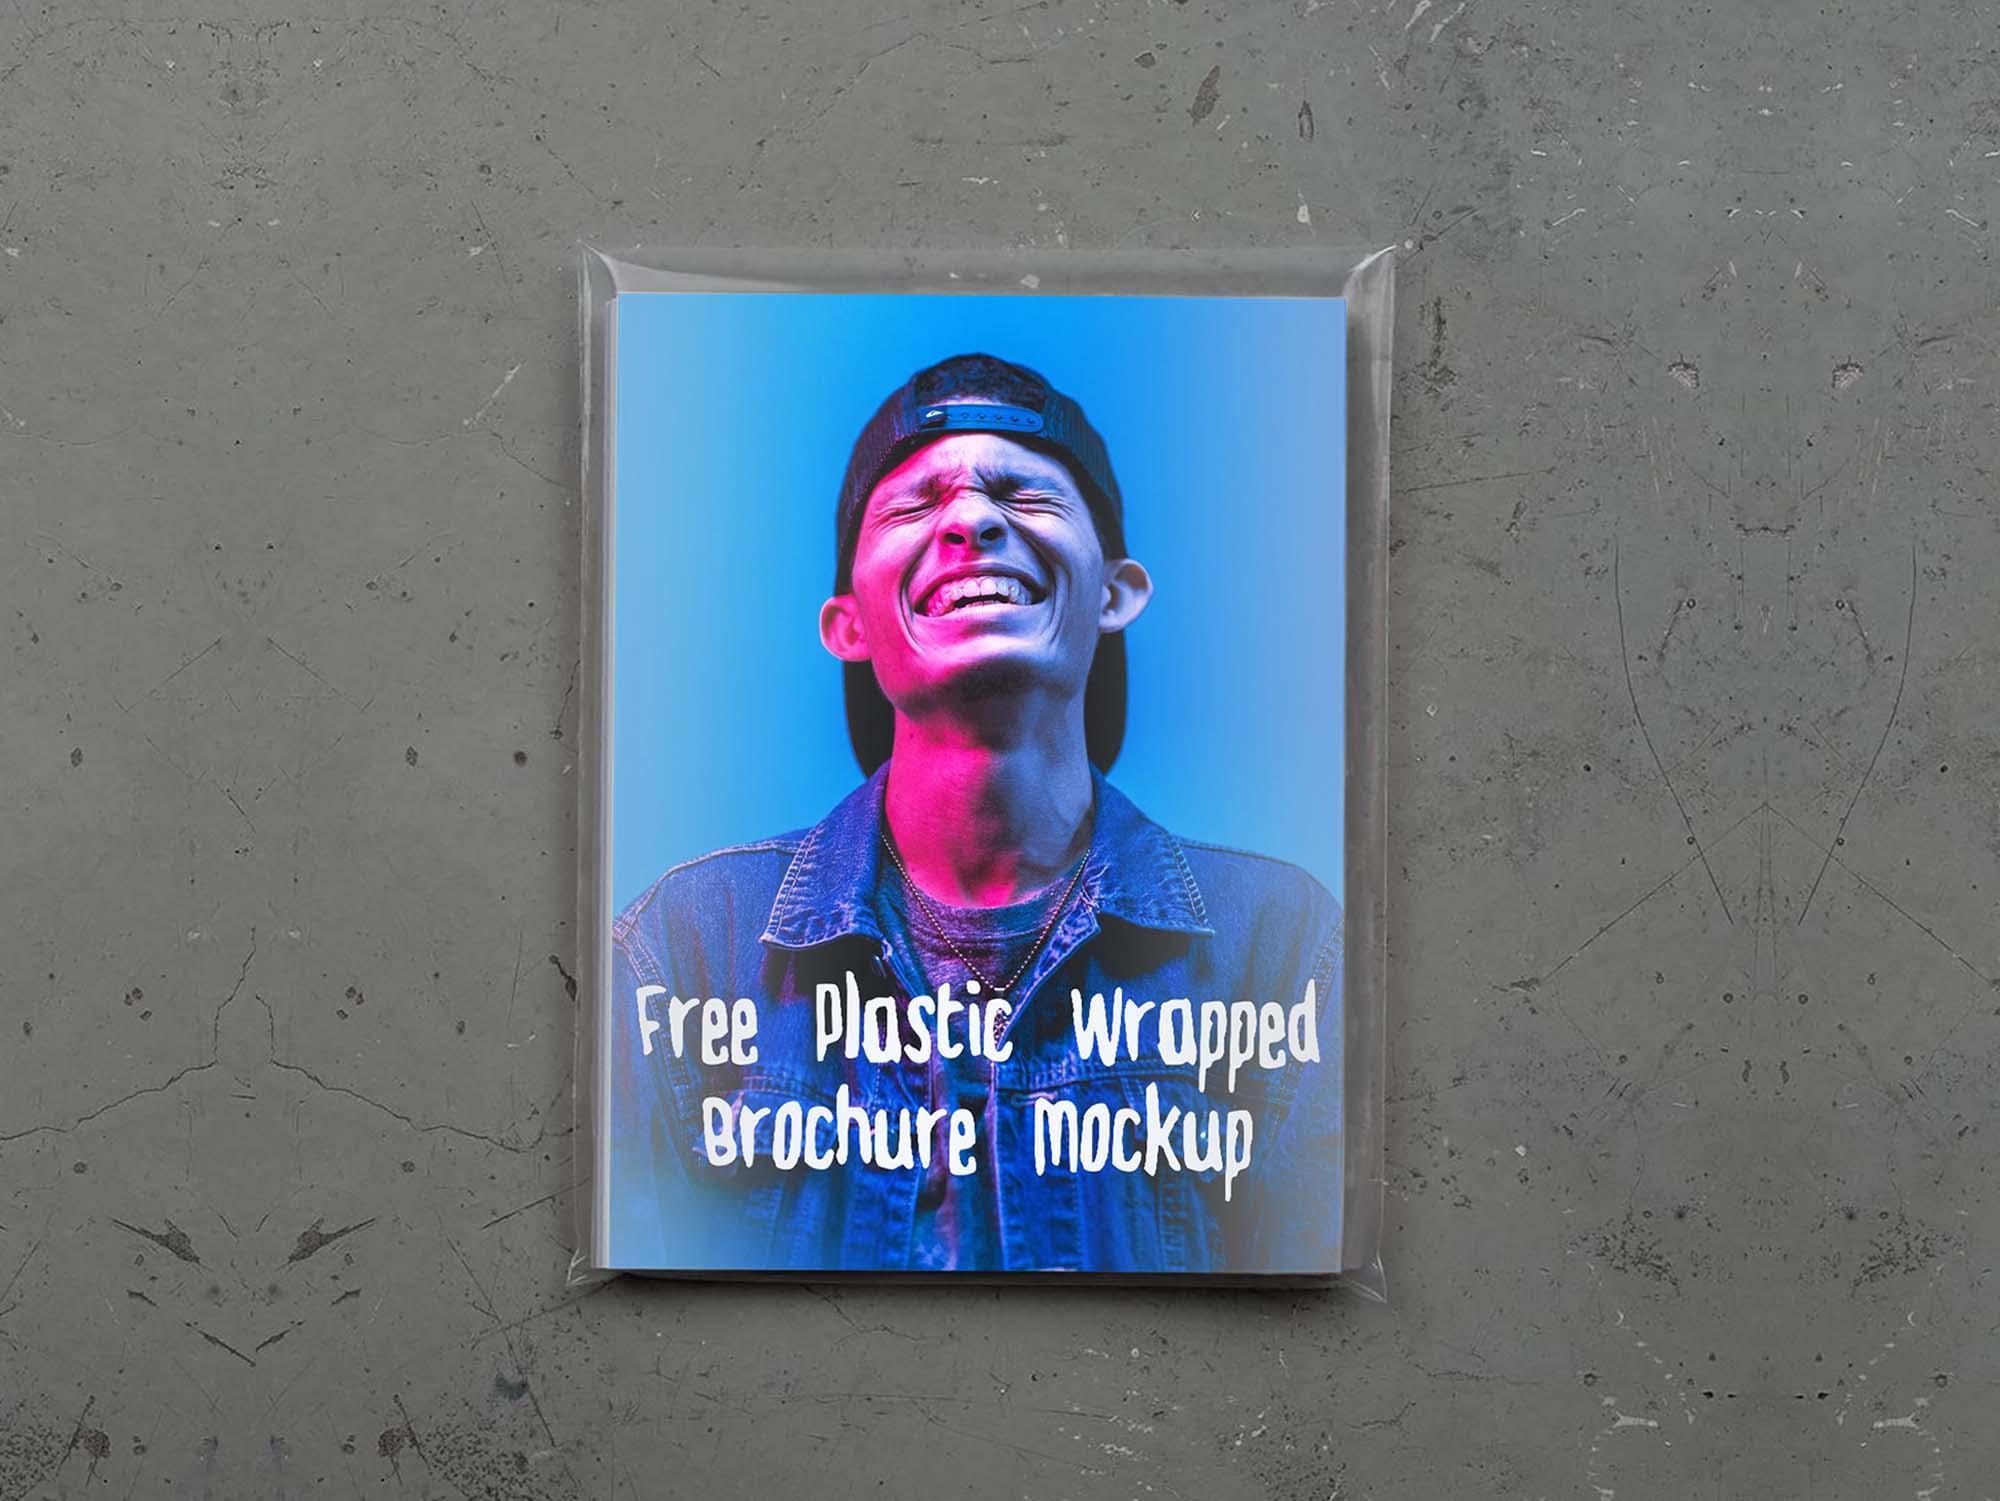 Plastic Wrapped Brochure Mockup